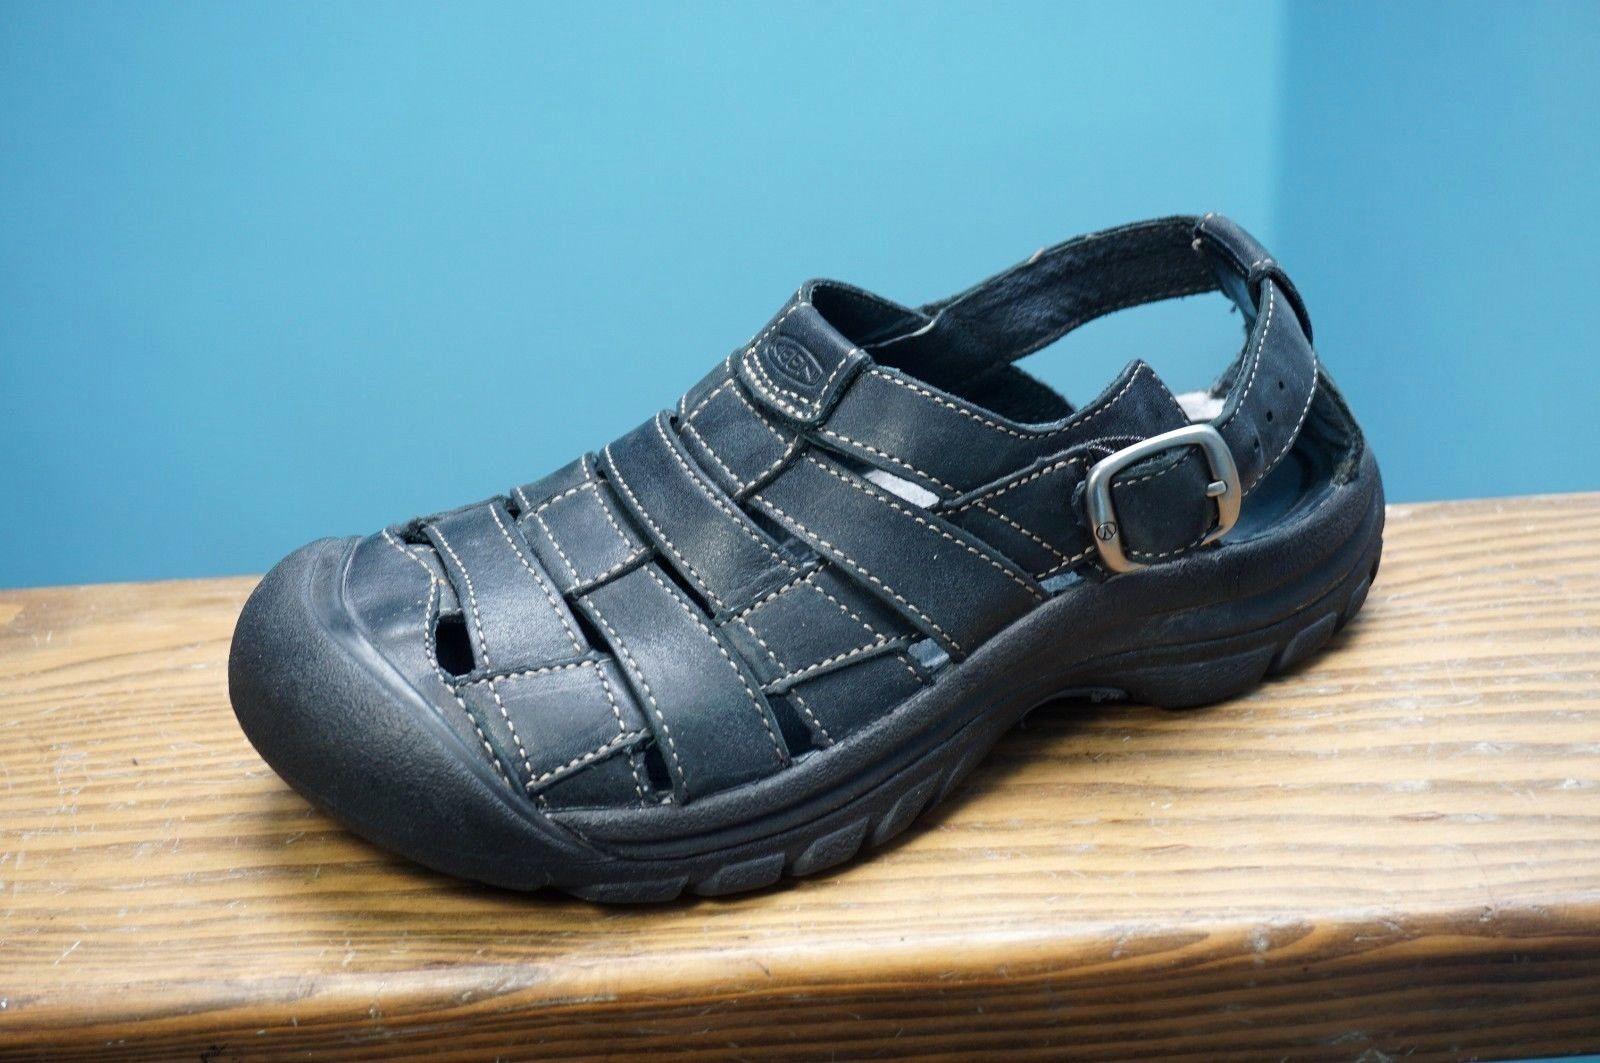 b82aadda3701 Women s KEEN Leather Fisherman Hiking Sport Sandals Shoes Grey Sz 7.5 Nice!